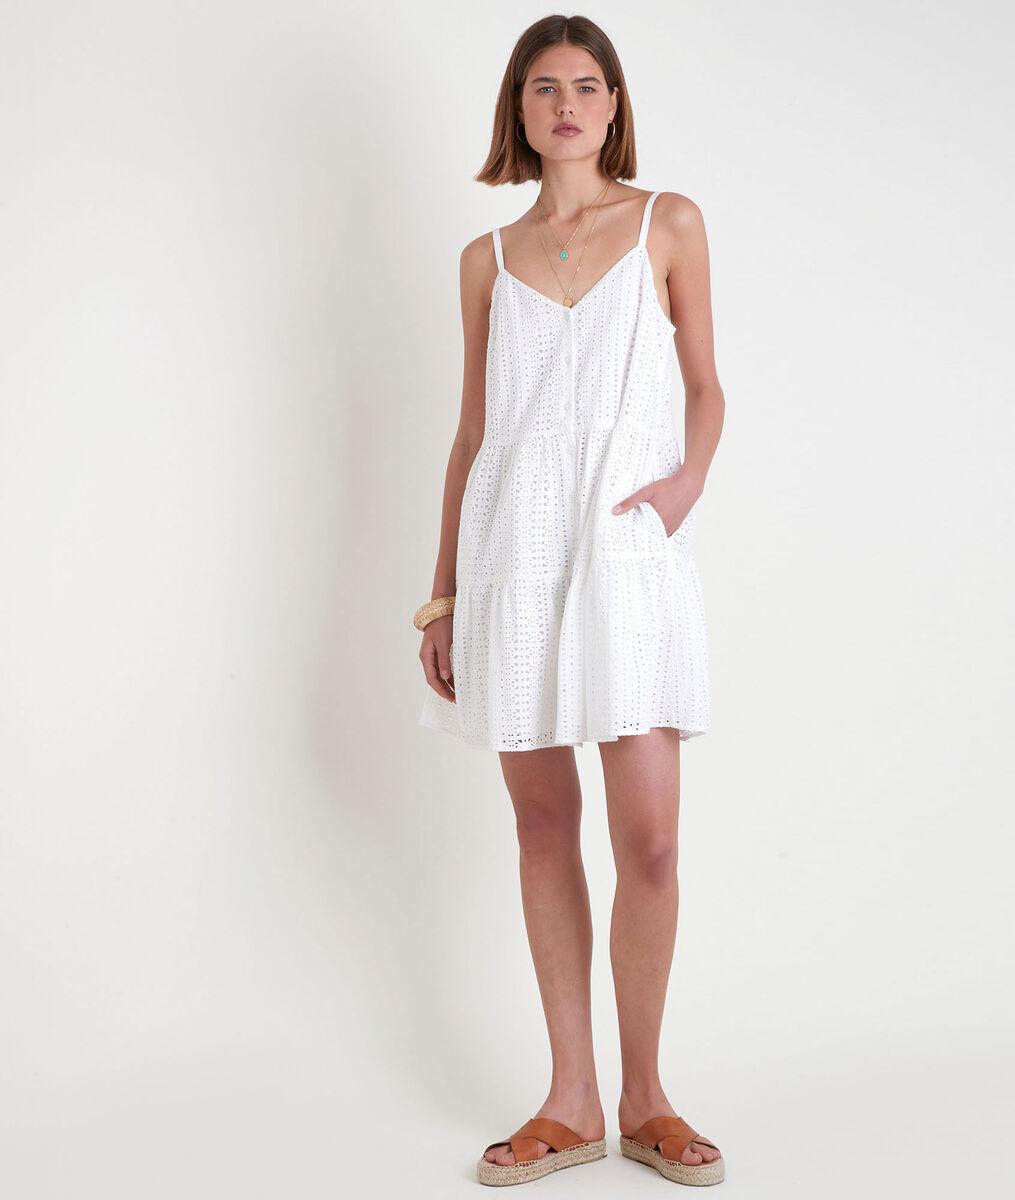 Robe mini à bretelles en broderie anglaise blanche Samia PhotoZ   1-2-3